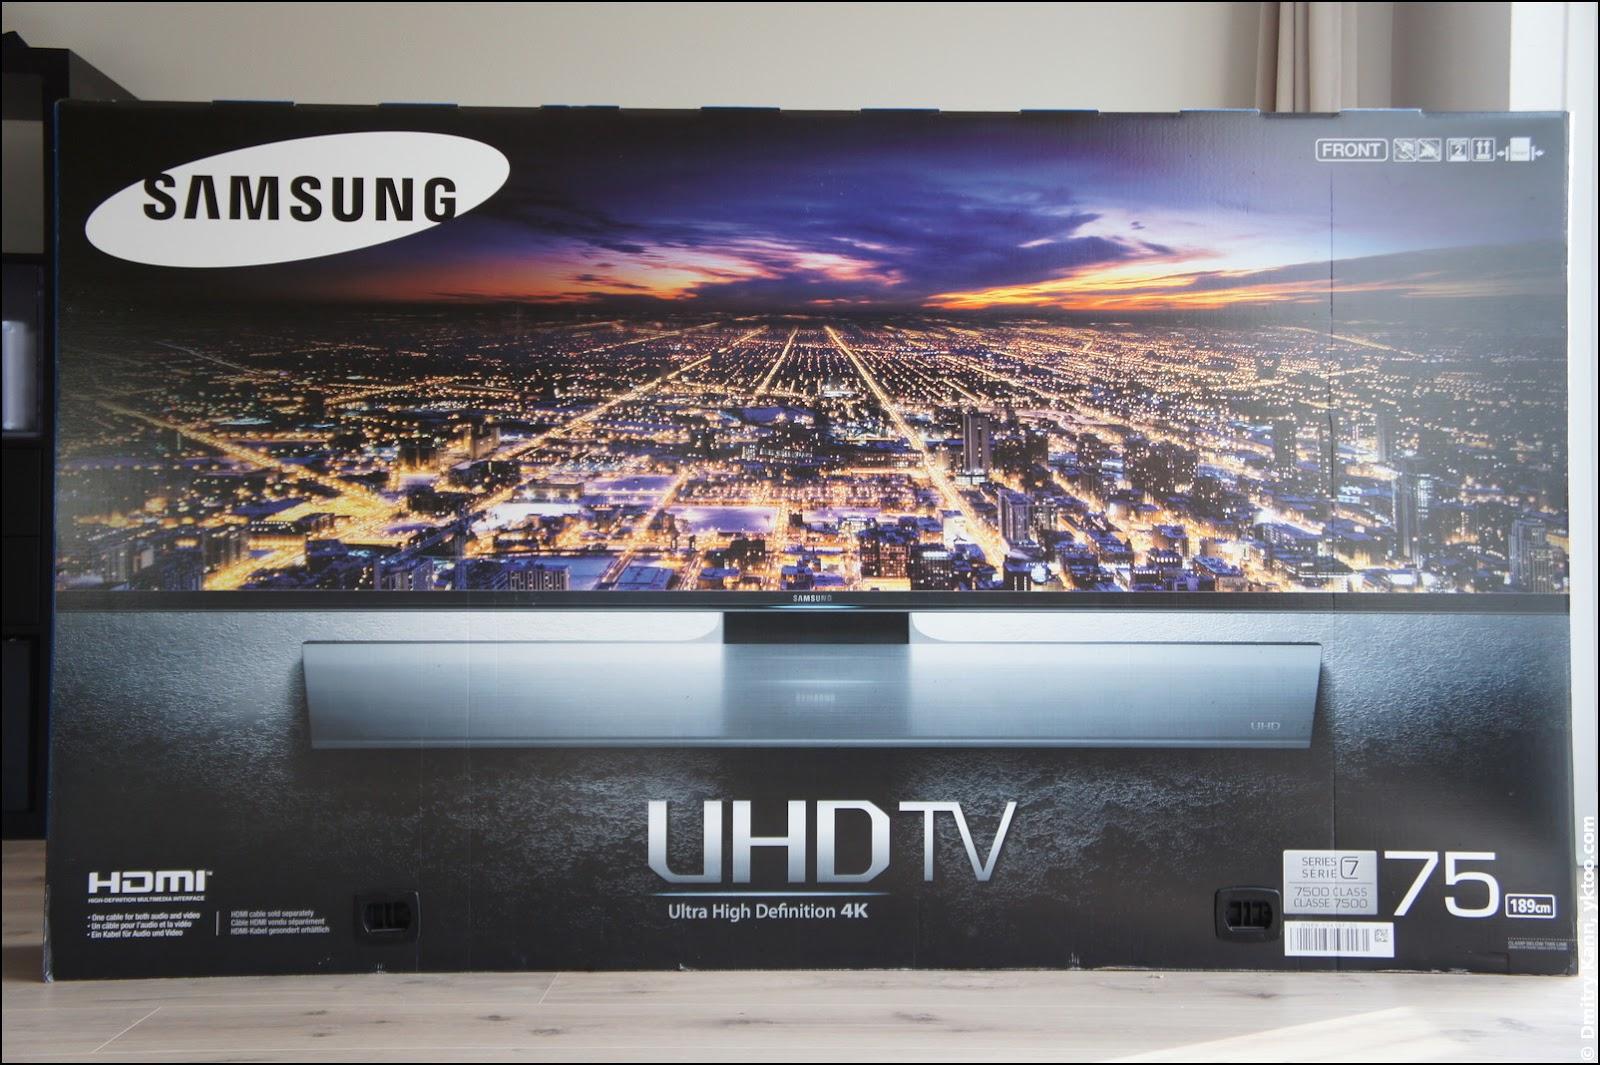 4k Uhd Tv Samsung Ue75hu7500 A Complete Review ‣ Part 1